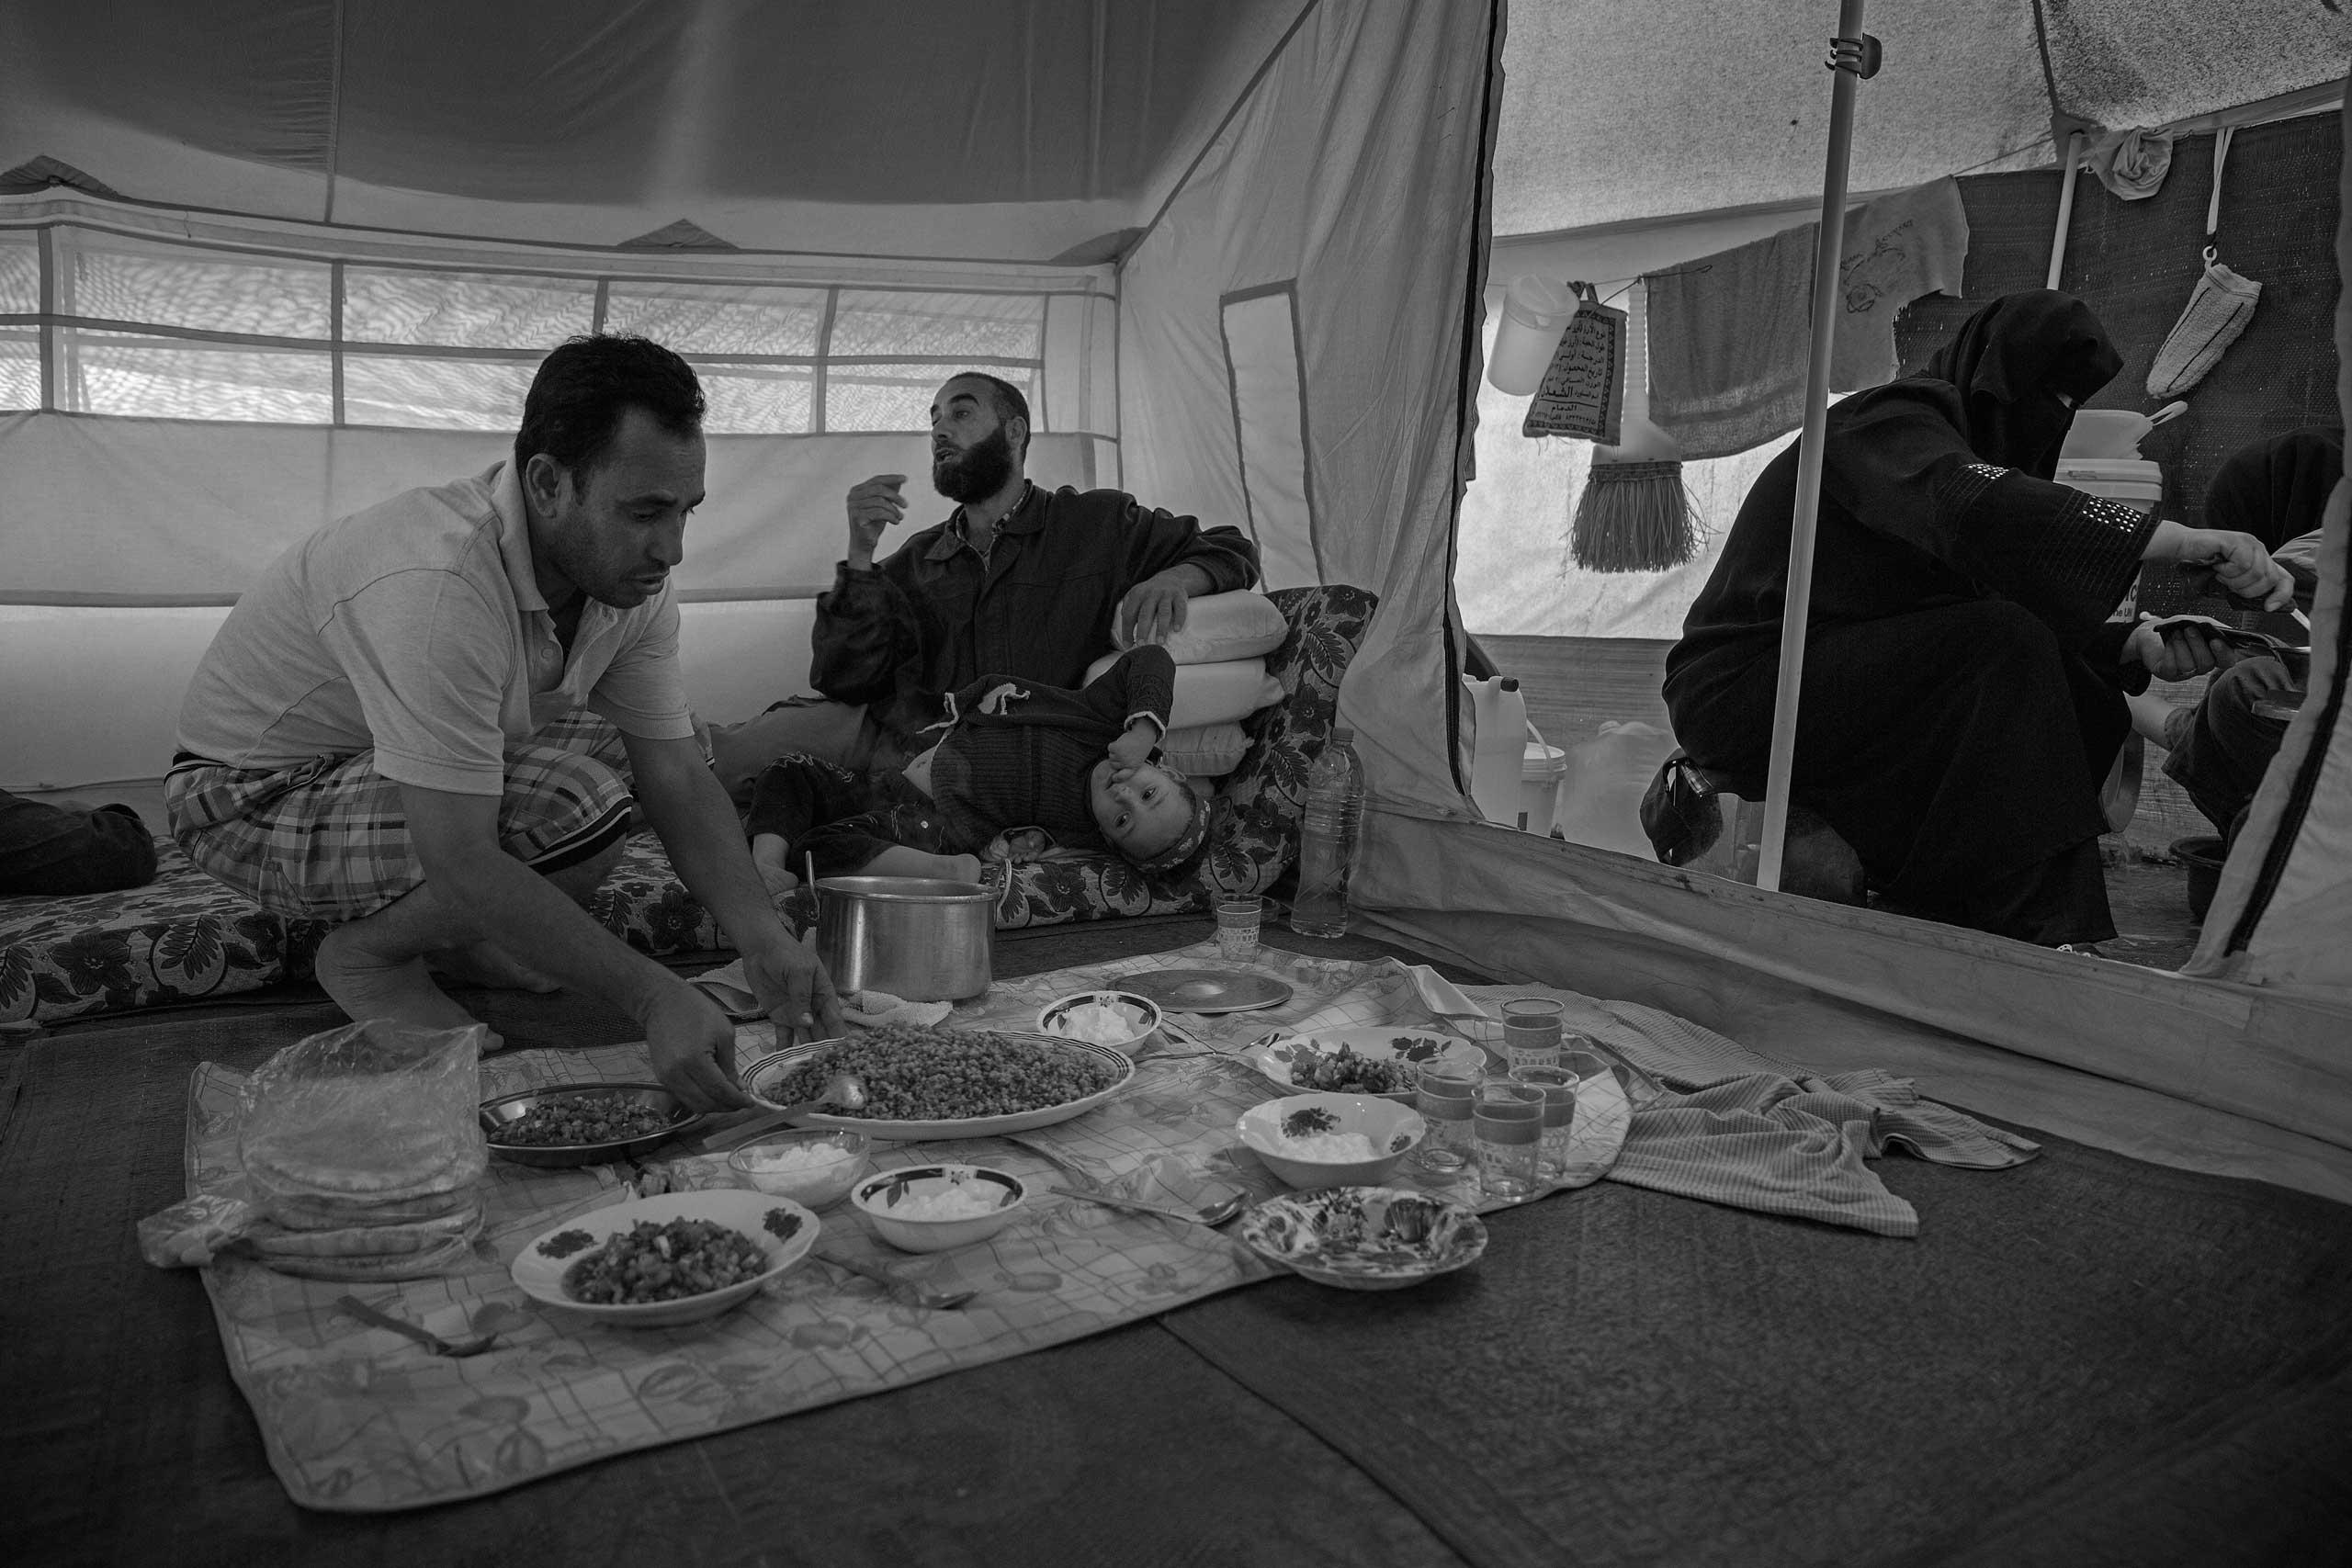 December 2013. Za'atari refugee camp, Jordan. Interior of a camp tent.